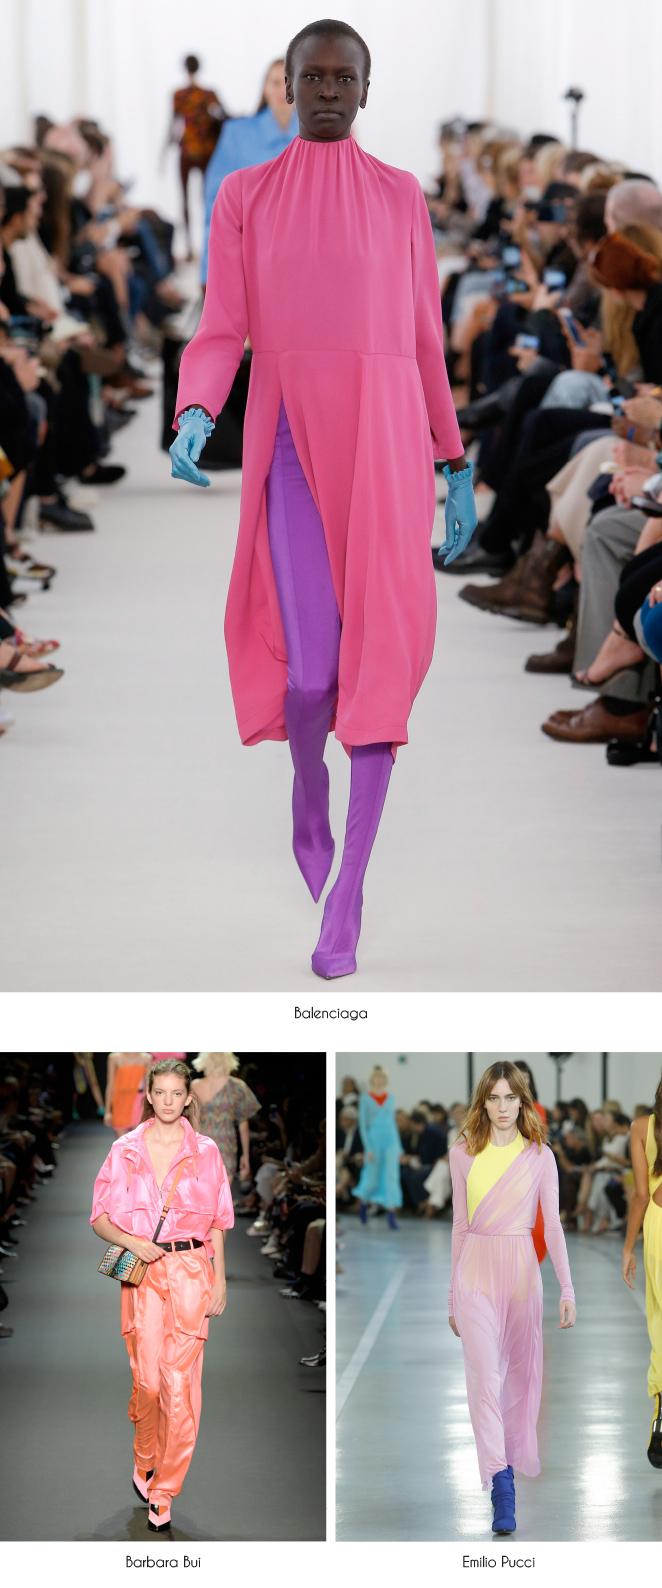 Rosa: Colorblocking